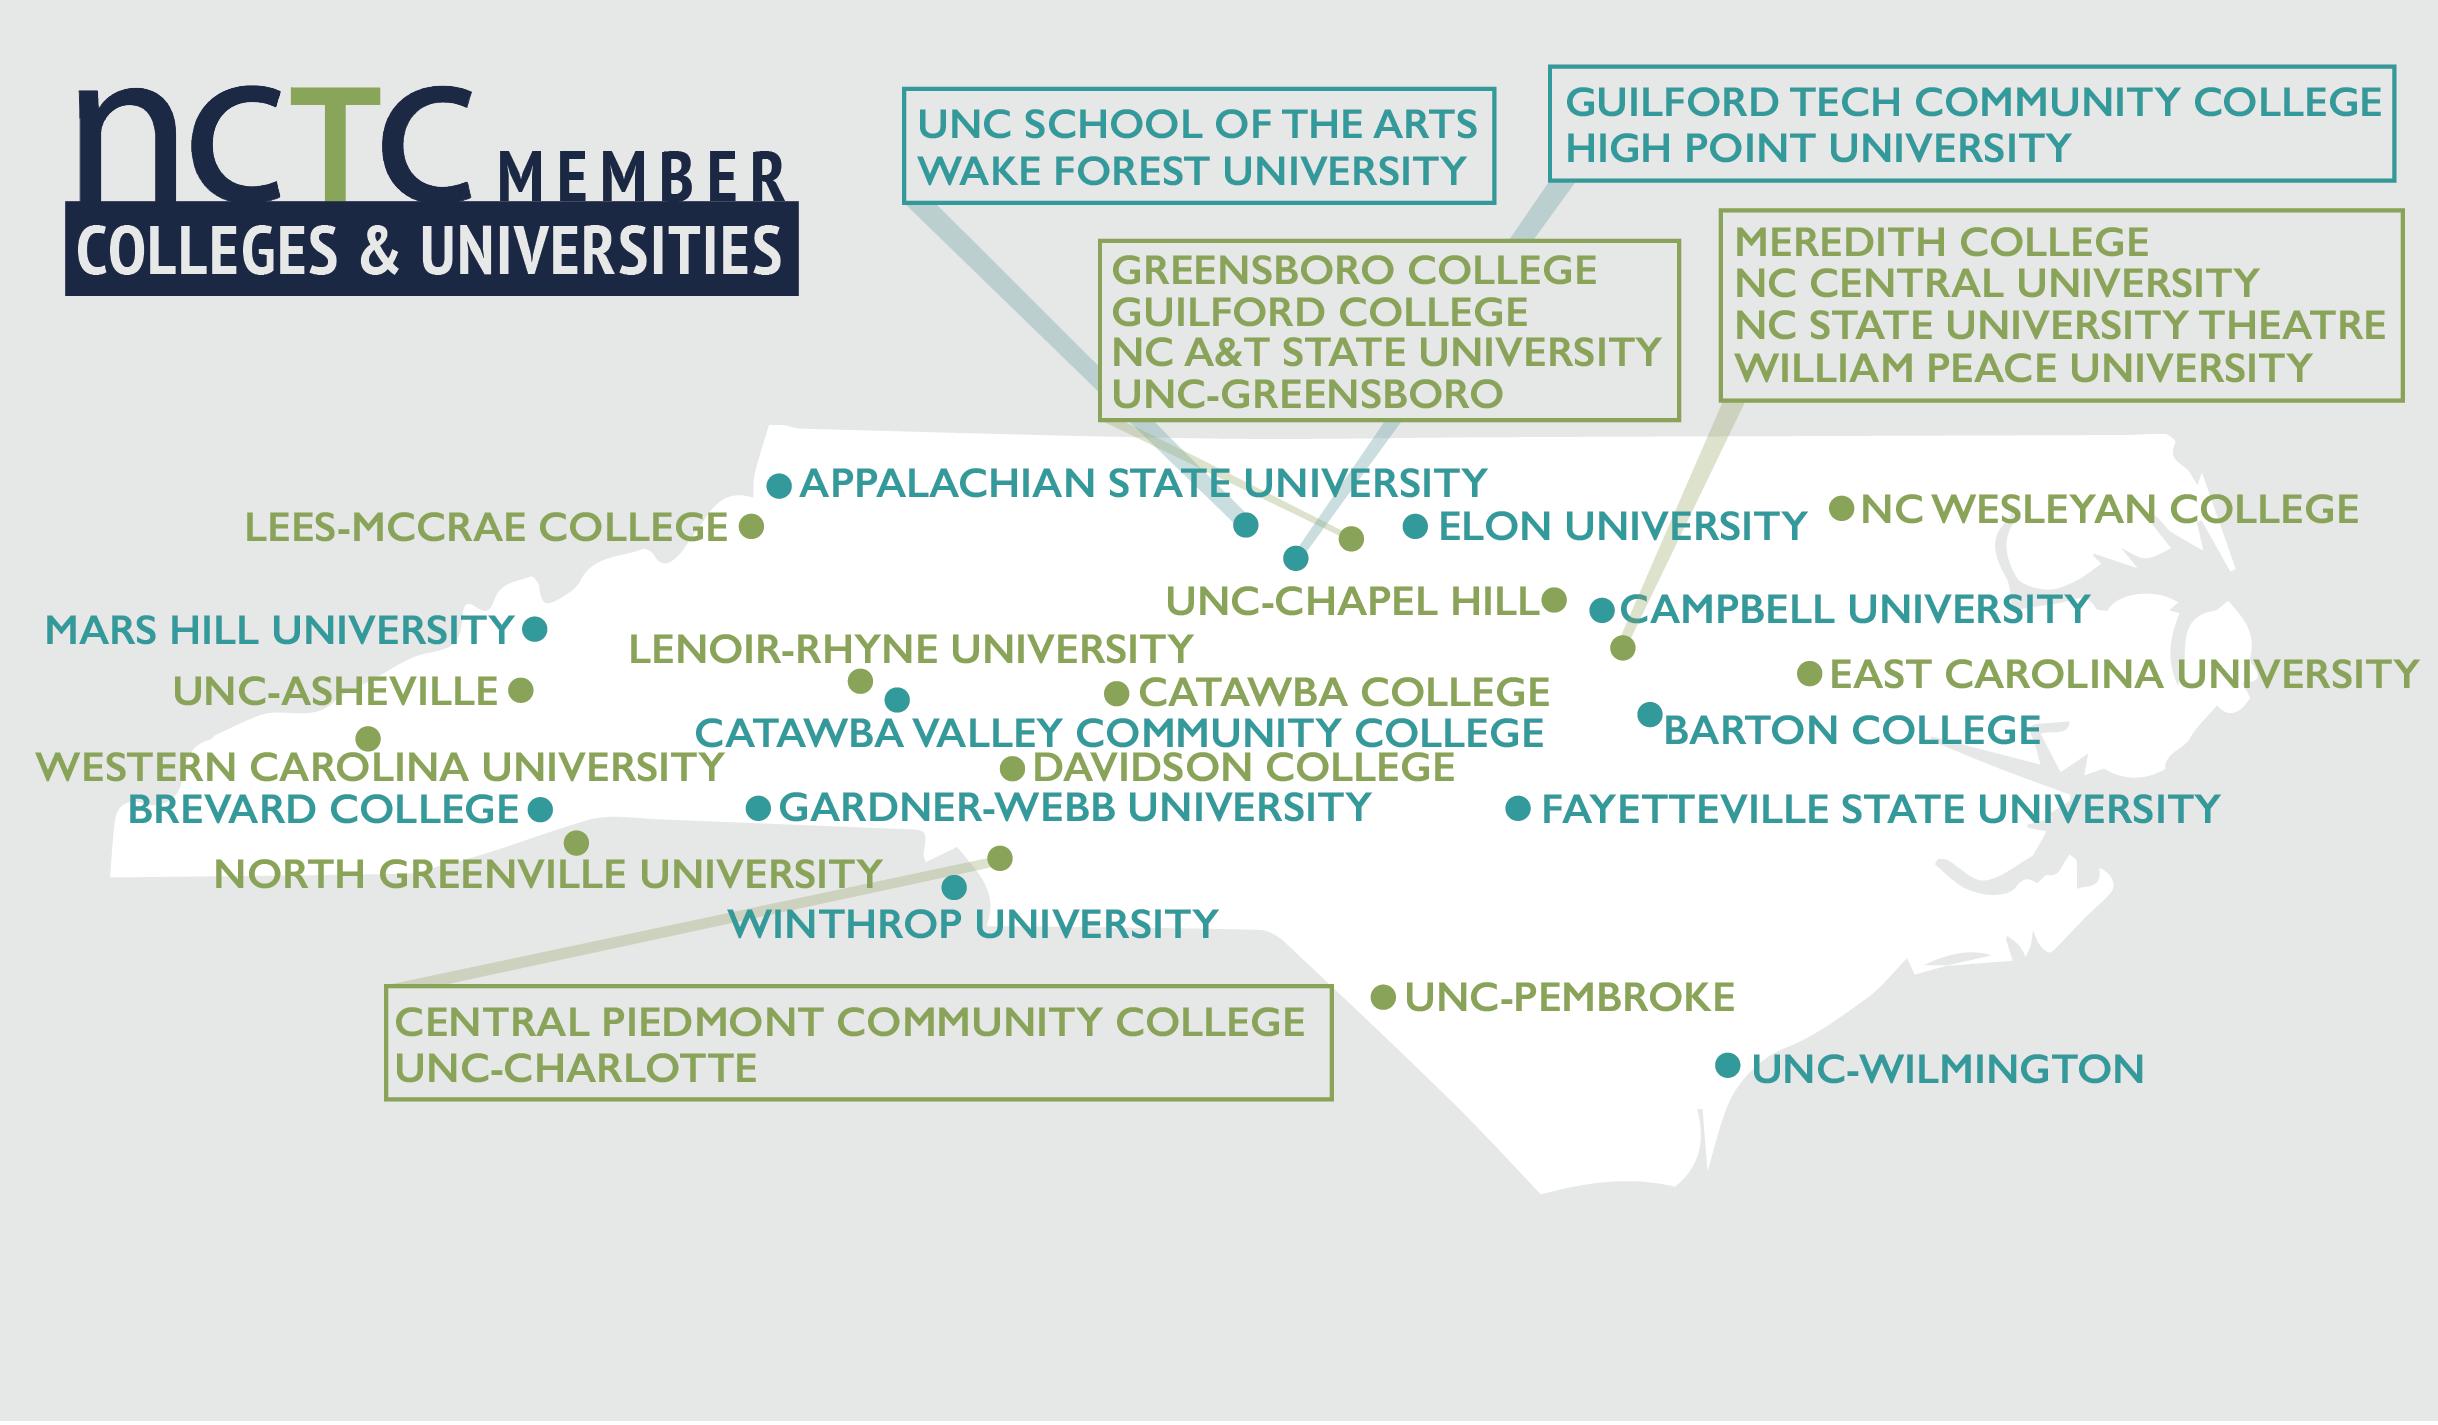 16-17-colleges-11-22-01